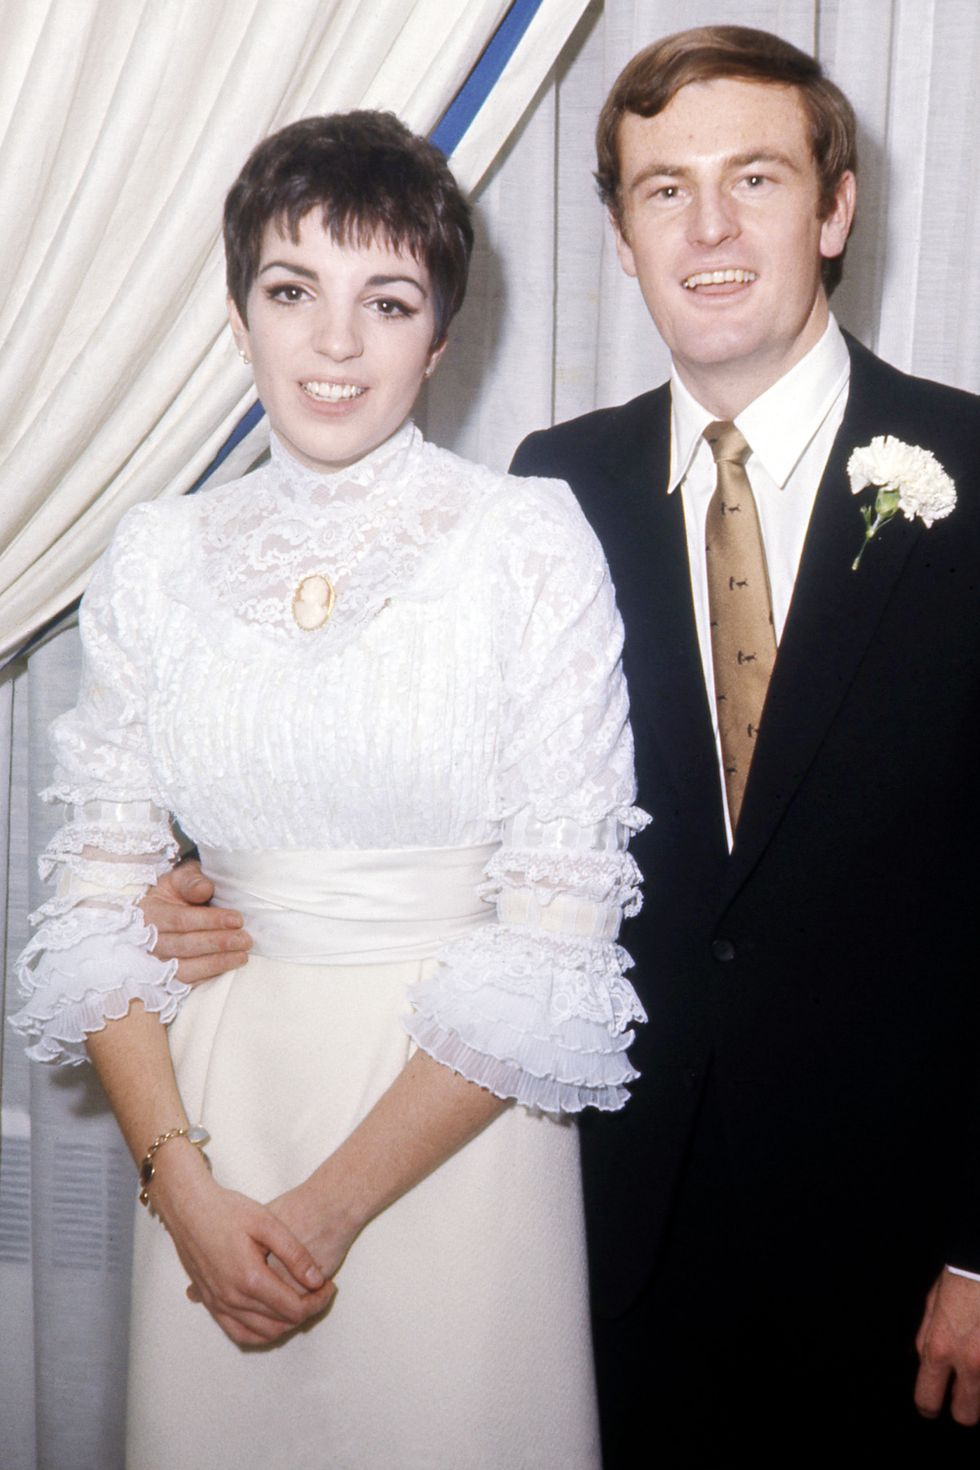 Liza Minelli's 1967 wedding dress